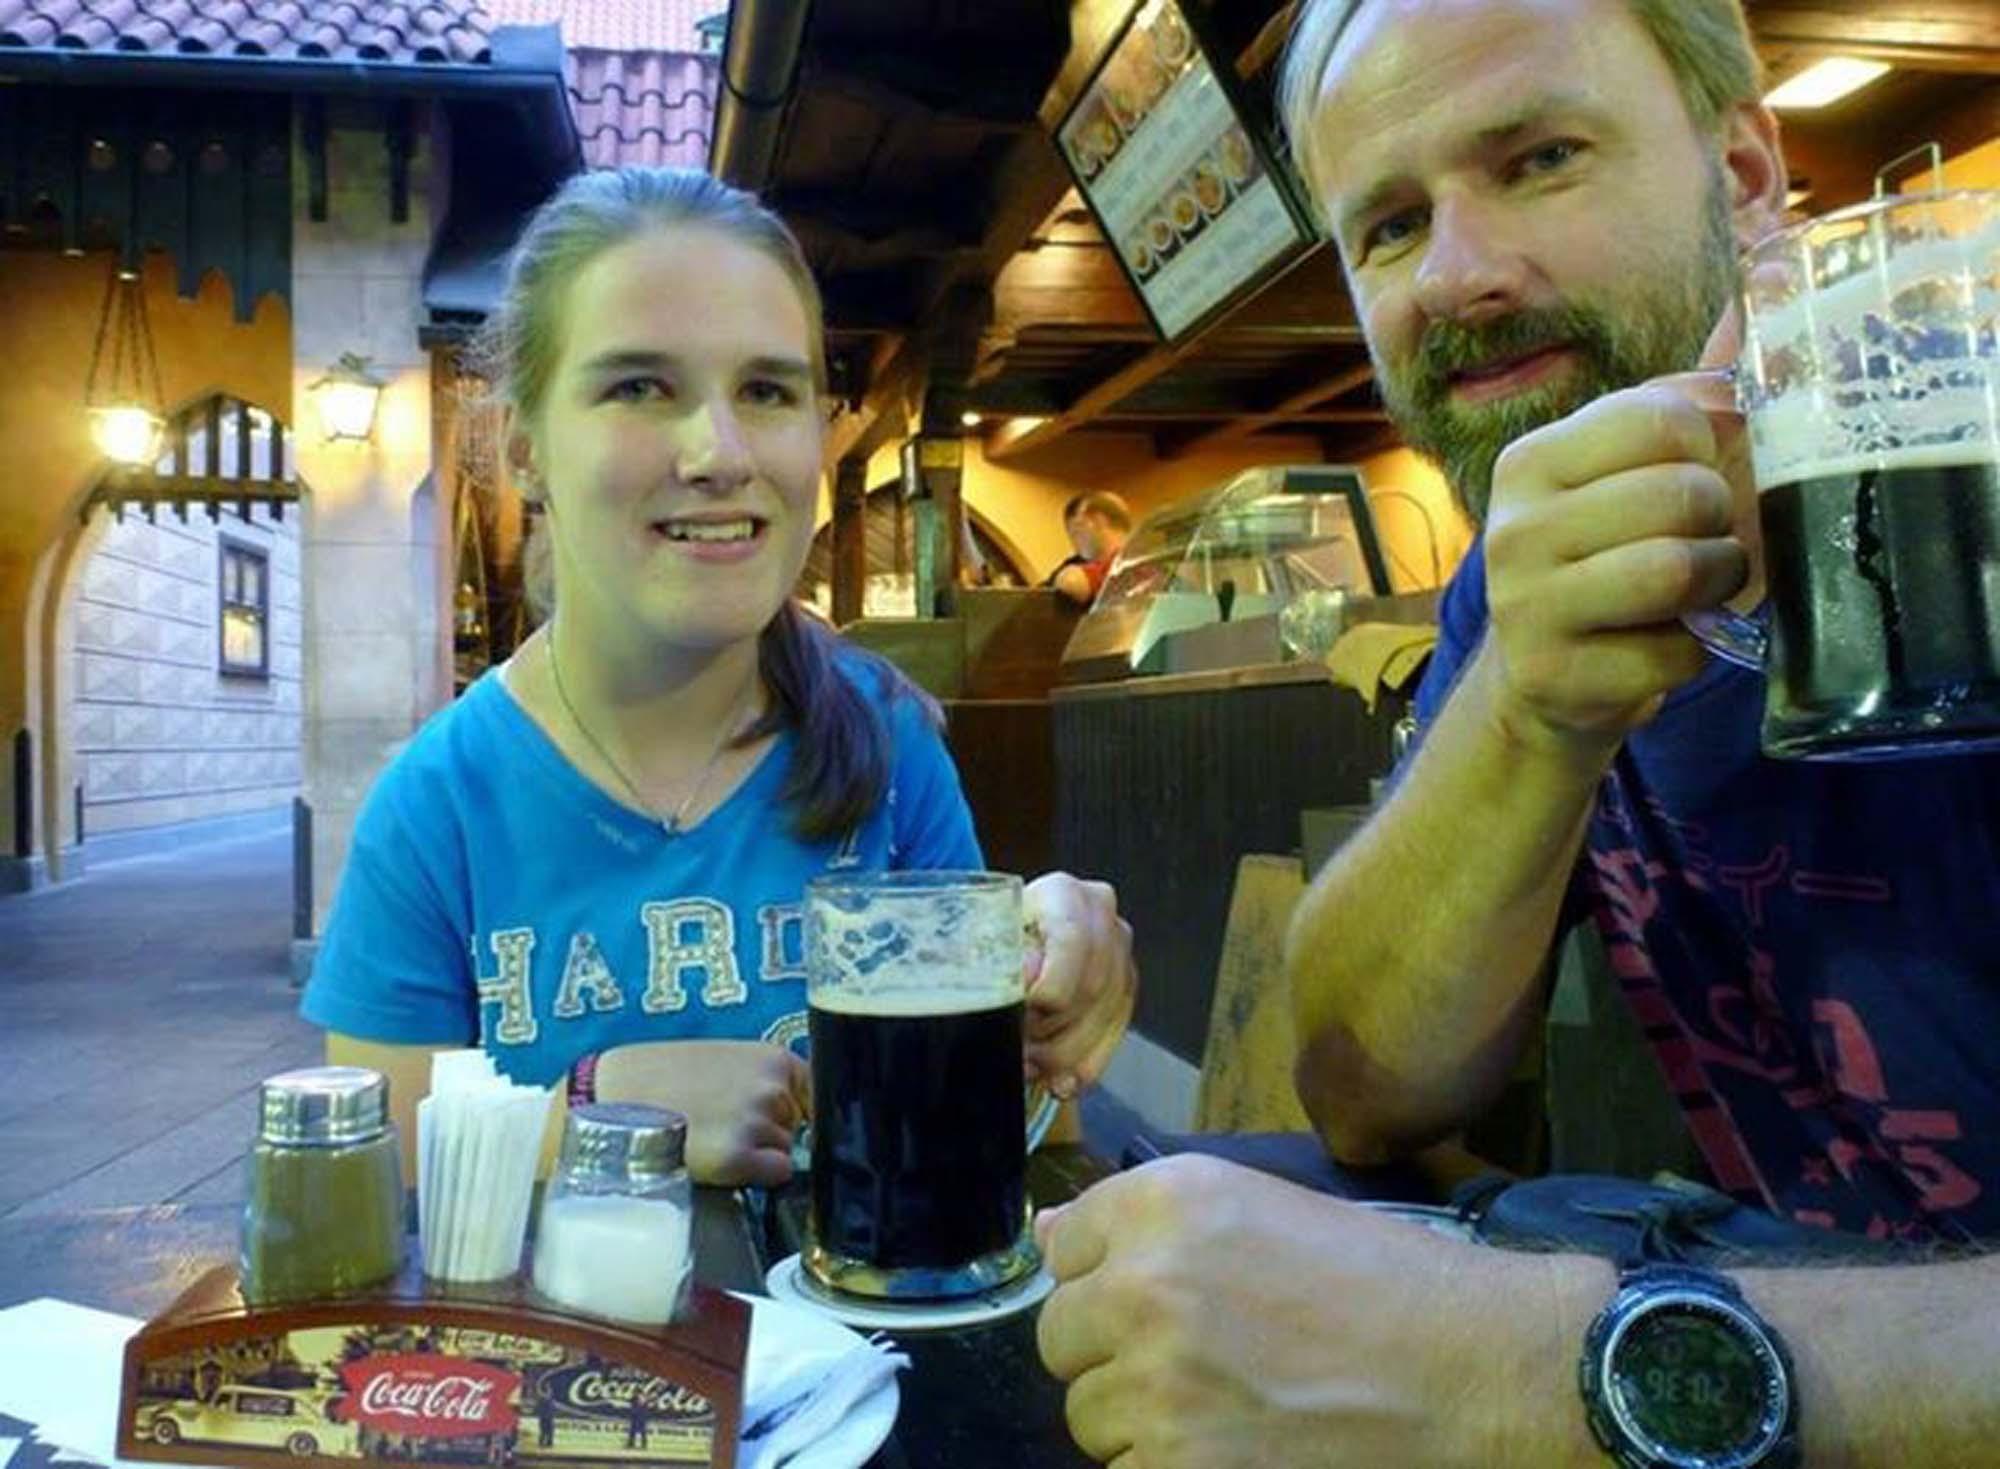 Gutes Bier in toller Atmosphäre